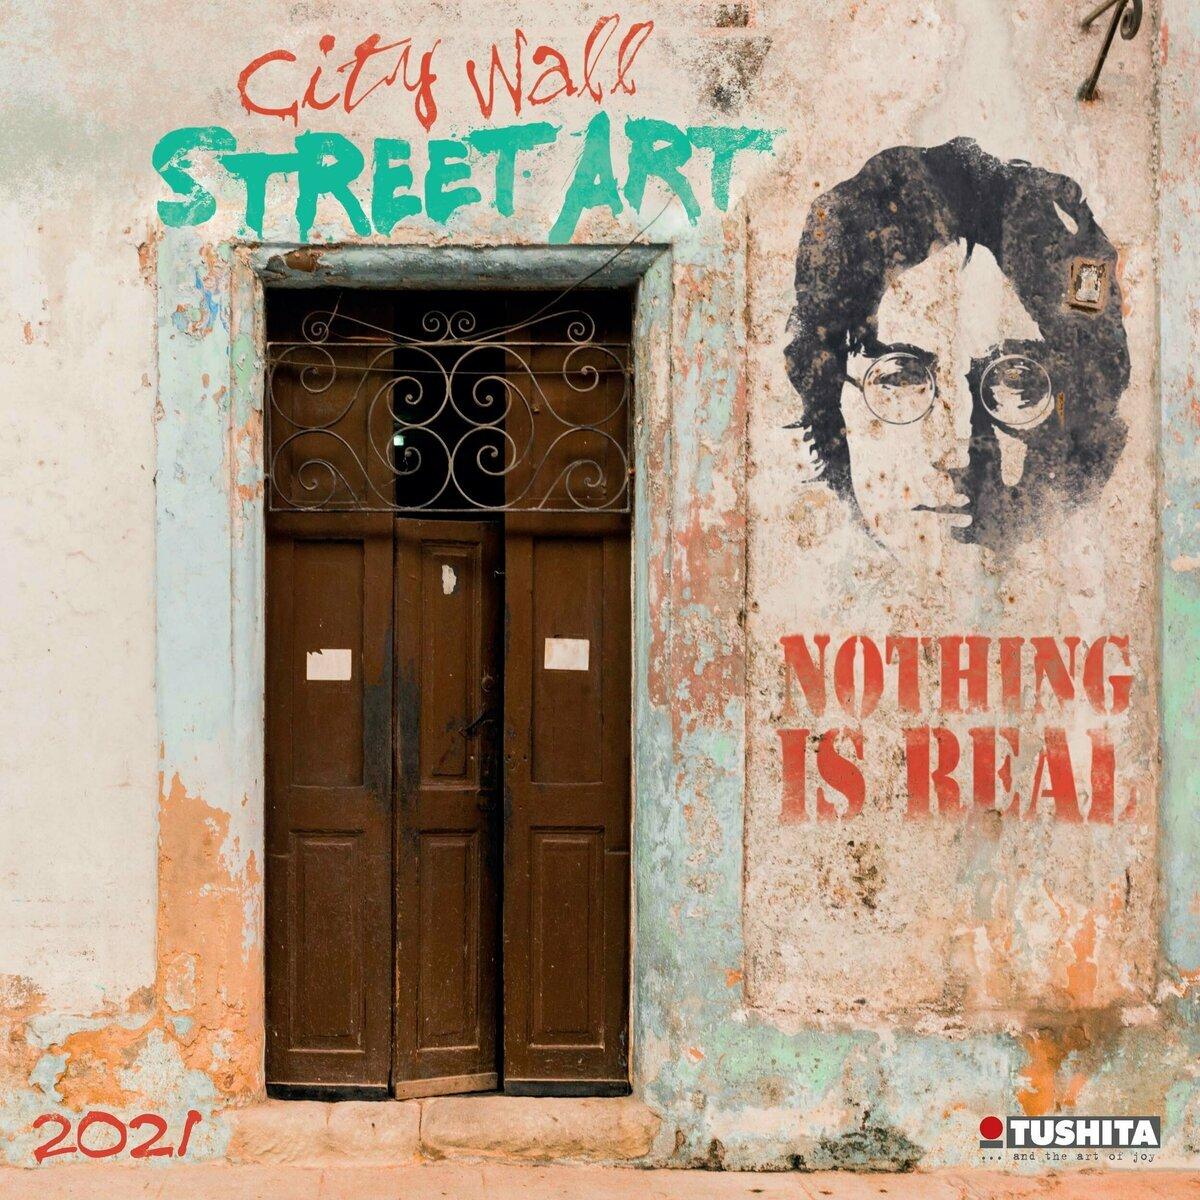 Calendrier 2021 Art Urbain / street art city